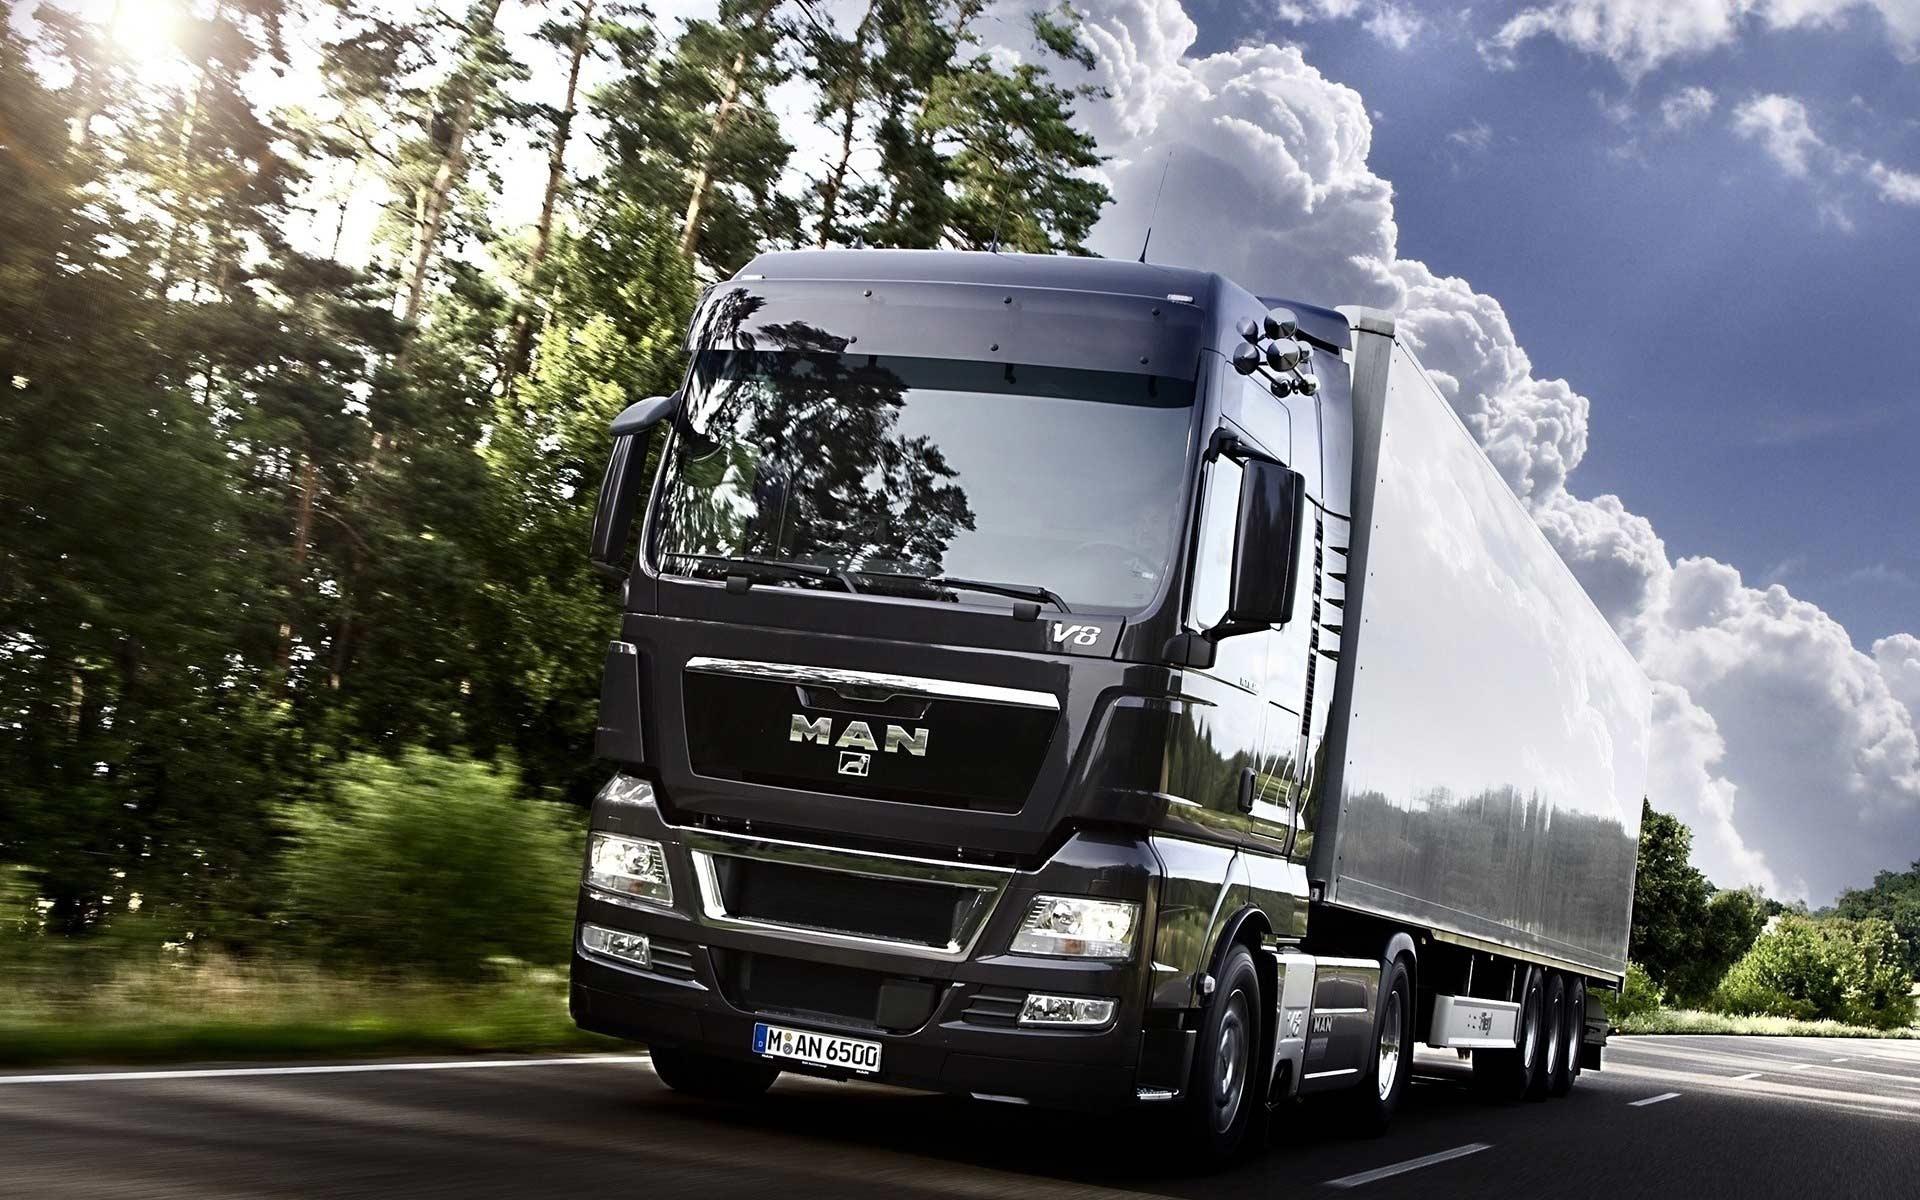 Картинки грузовиков ман на рабочий стол